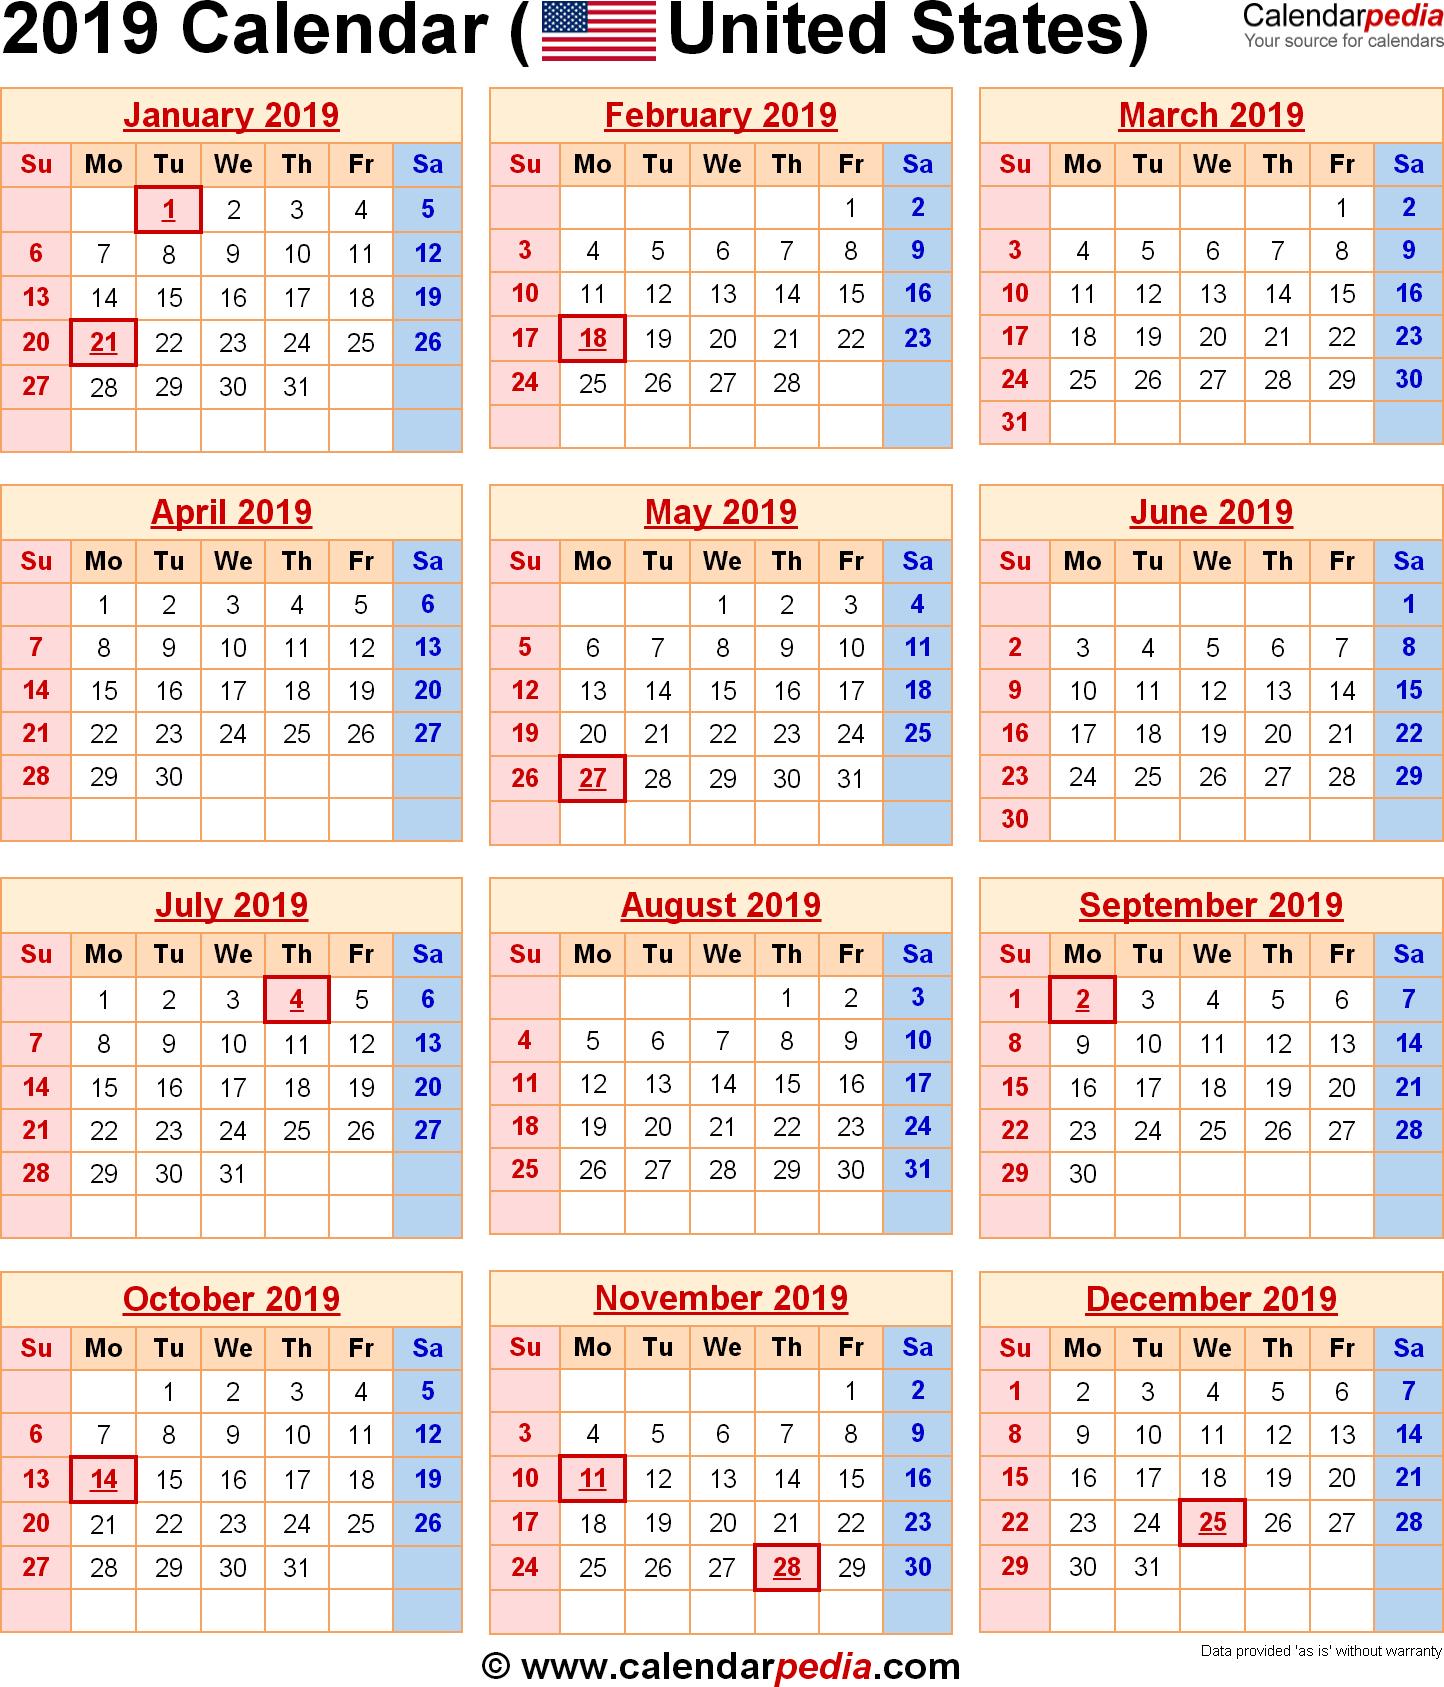 2019 Calendar United States | Us Federal Holidays | 2019 Calendar Us Calendar 2019 Us